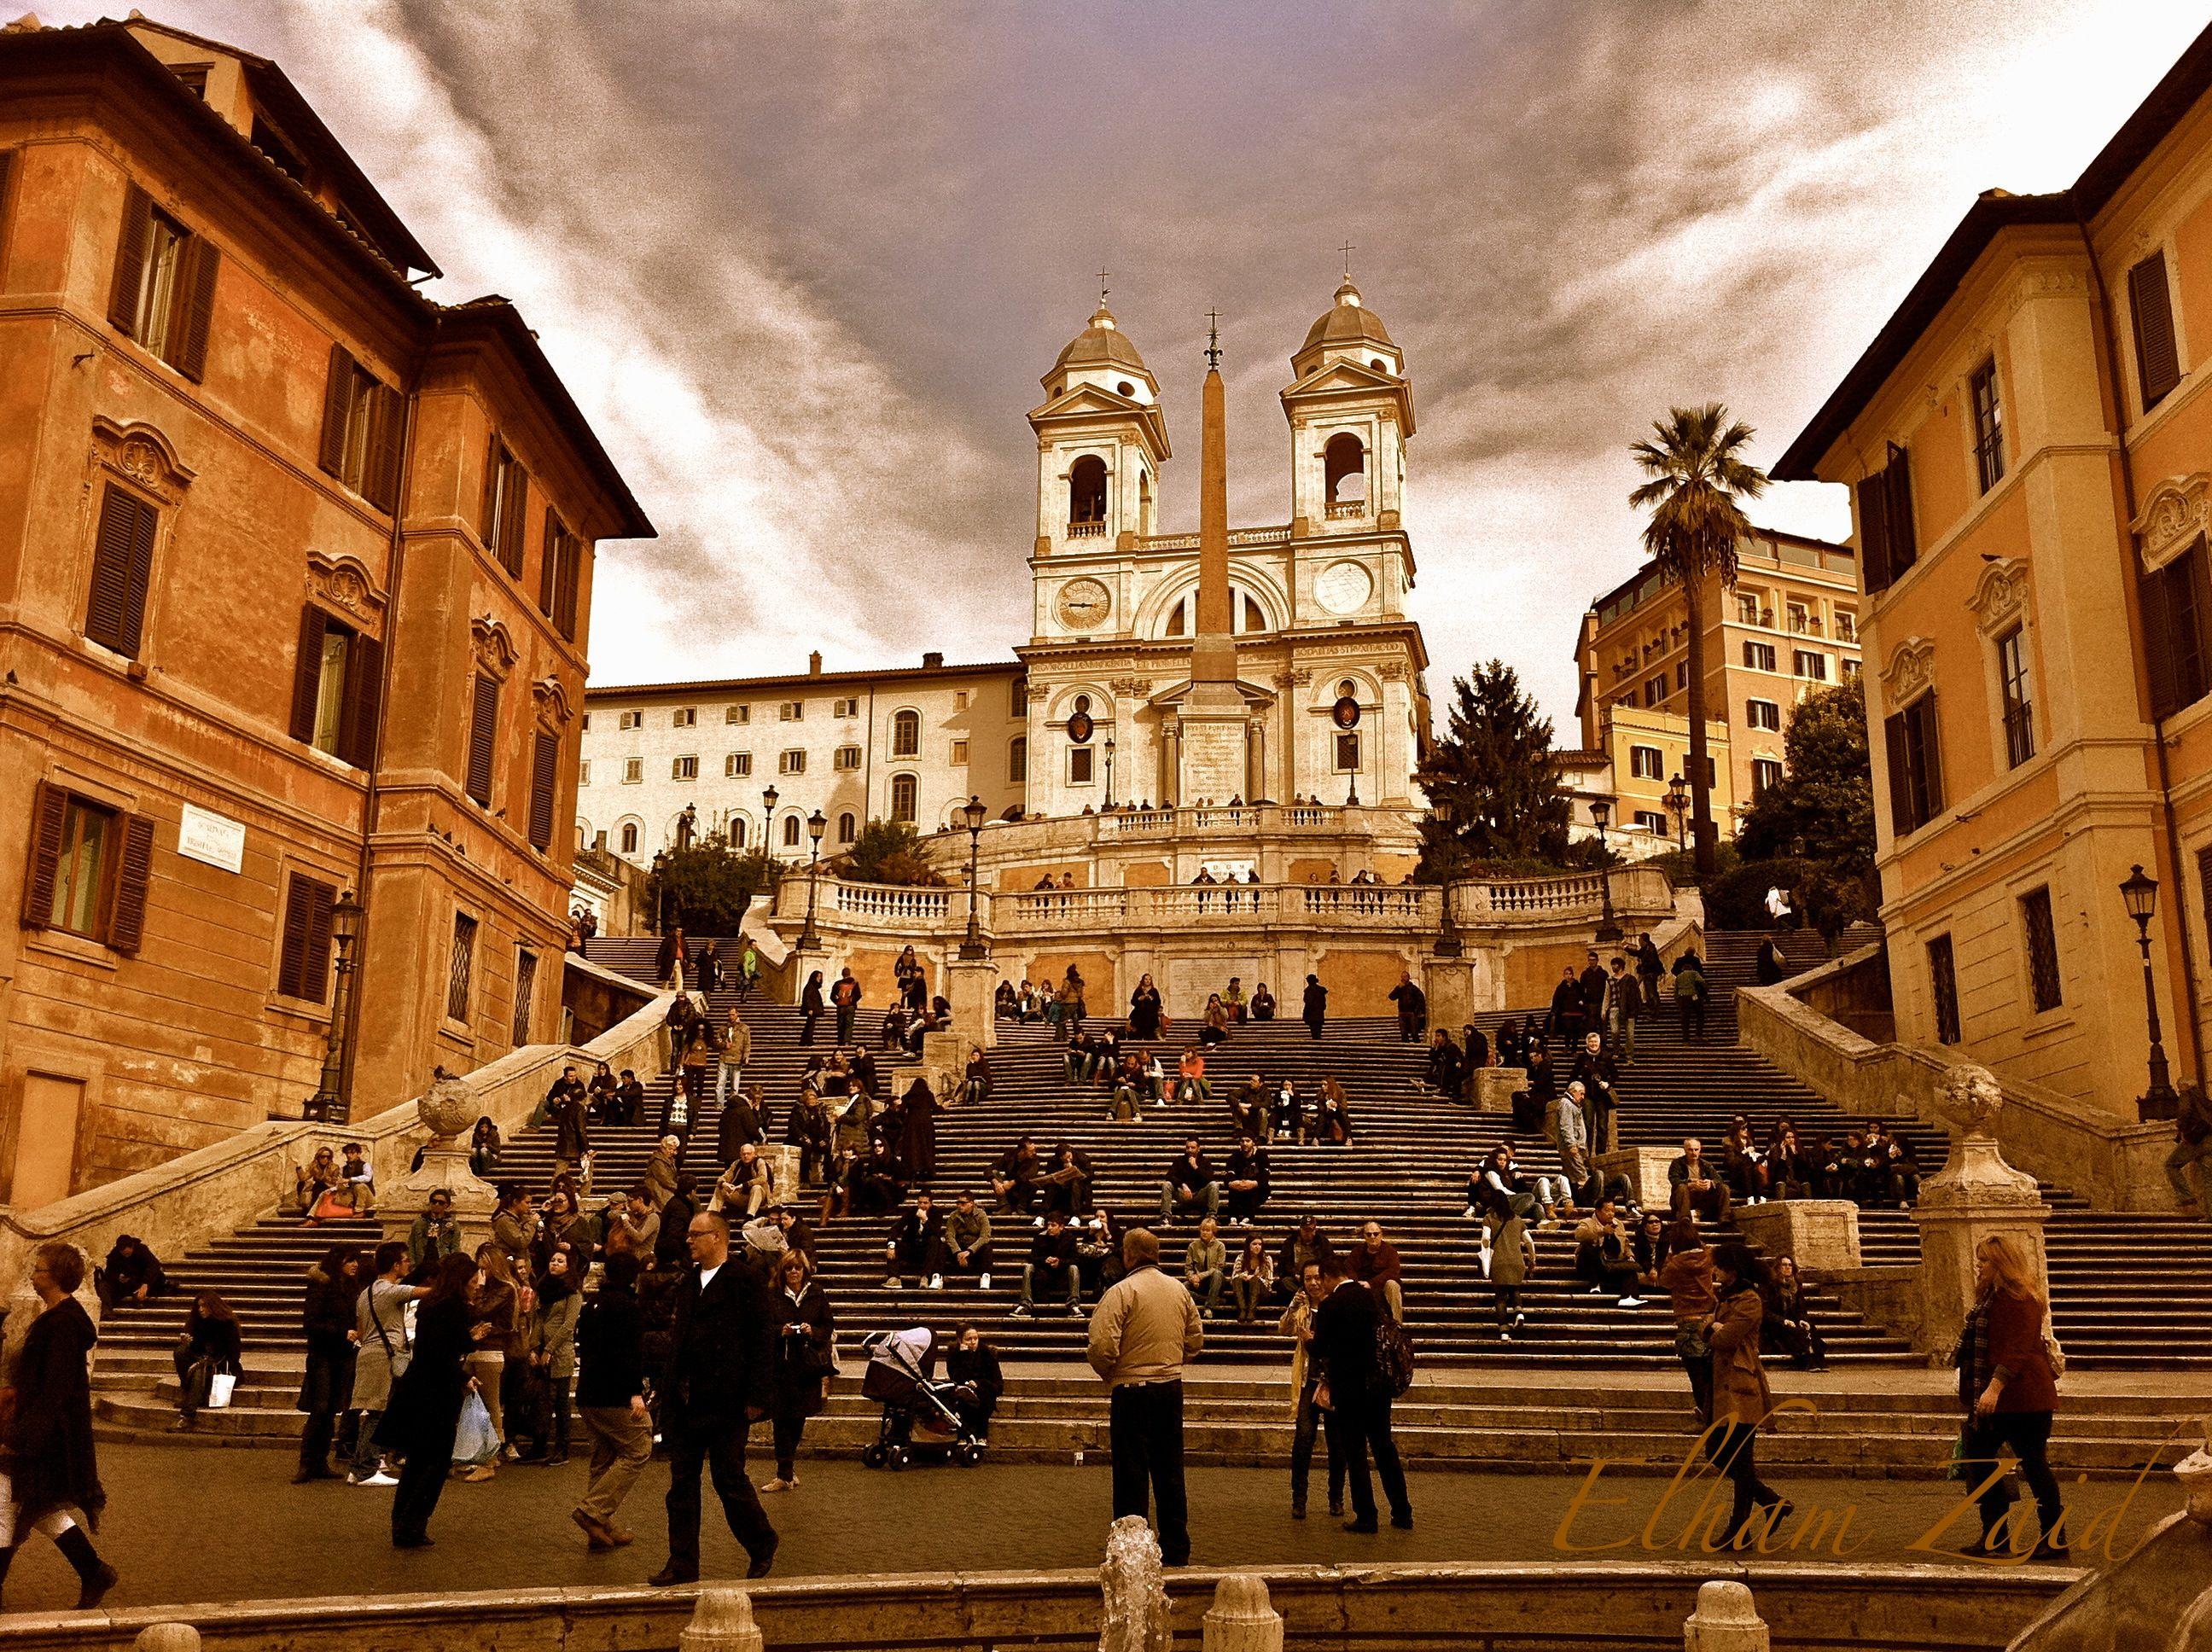 My photography, Rome, Italy, Spanish steps. Elham Zaid.